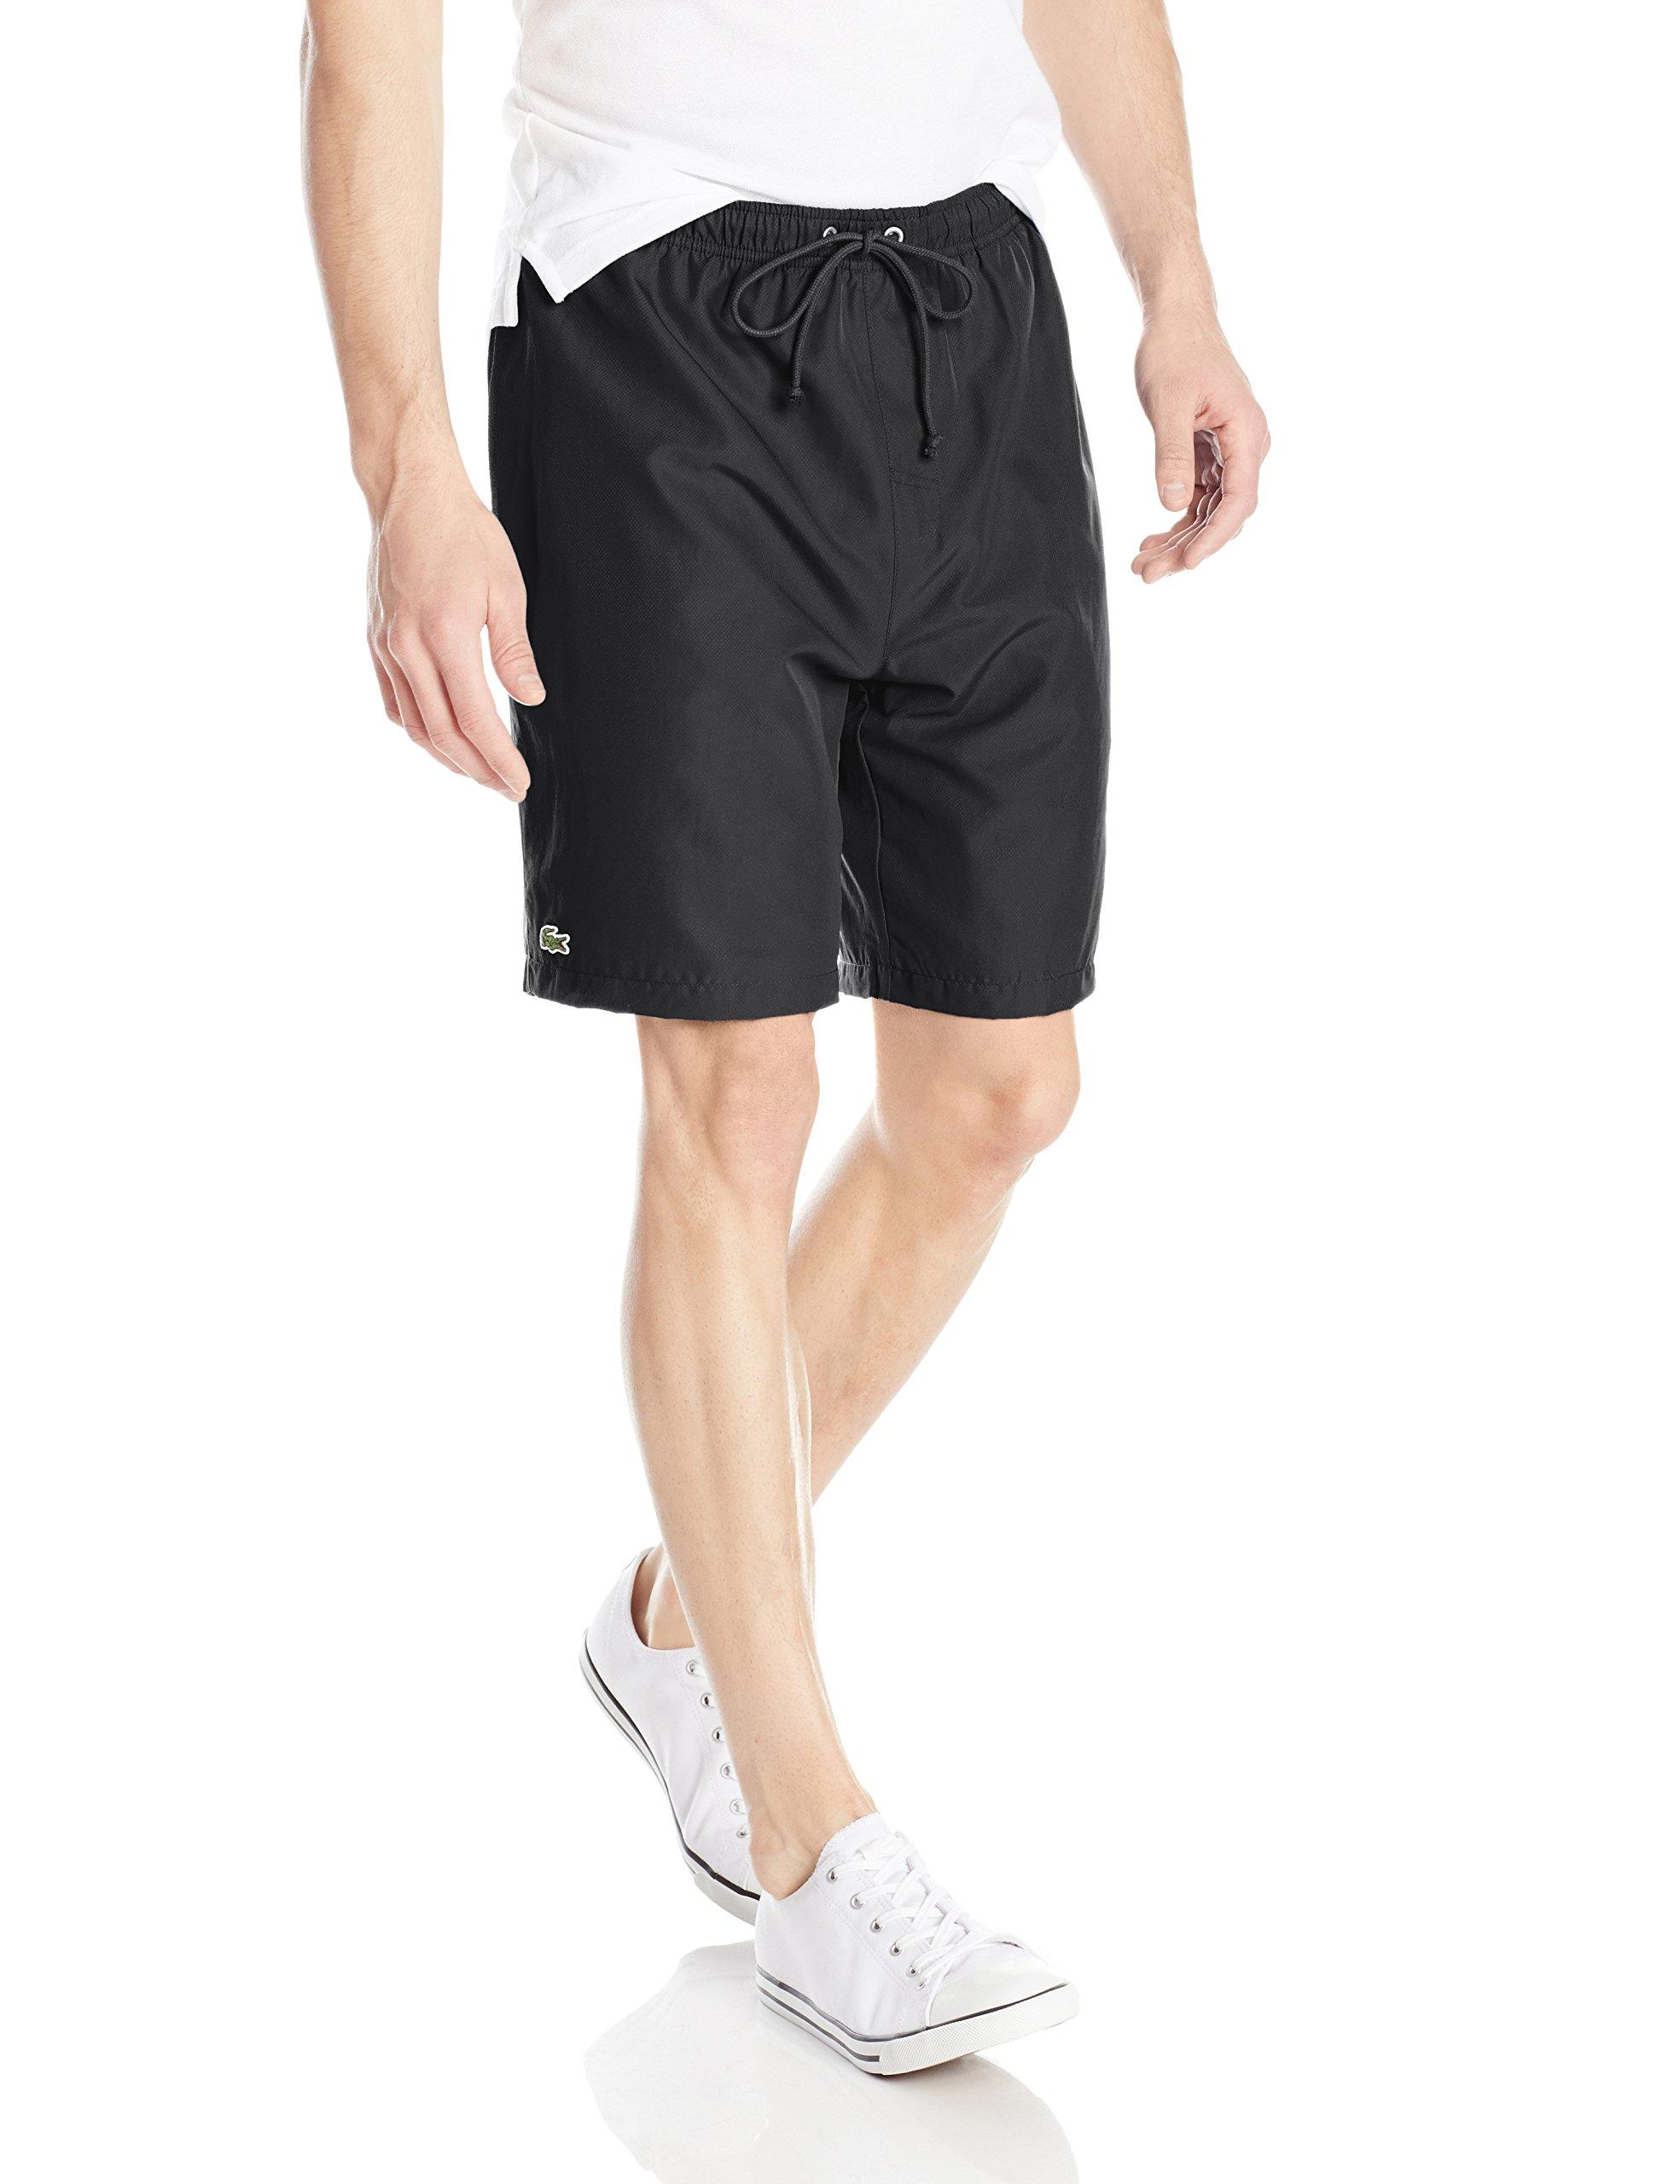 Lacoste Men's Sport Tennis Shorts, Black, Medium